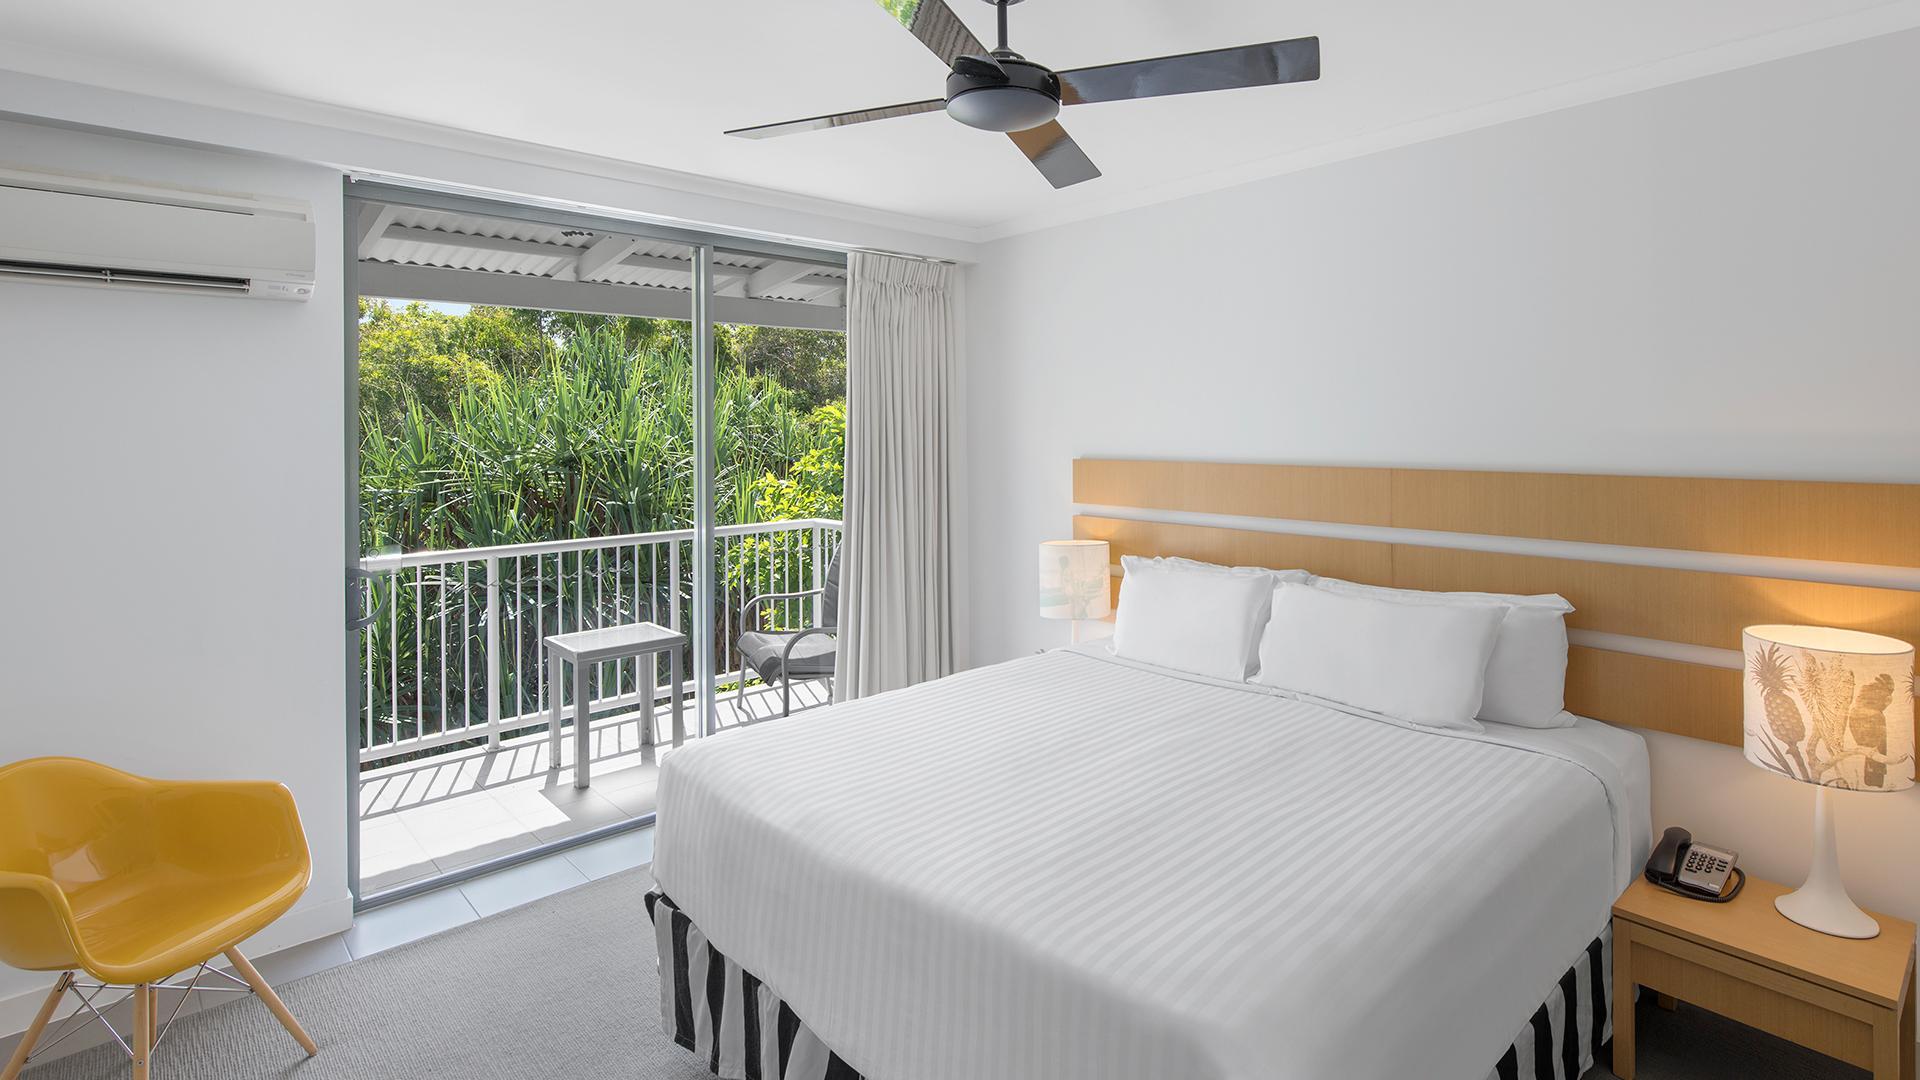 Hotel Room Garden View image 1 at Oaks Port Douglas Resort by Douglas Shire, Queensland, Australia